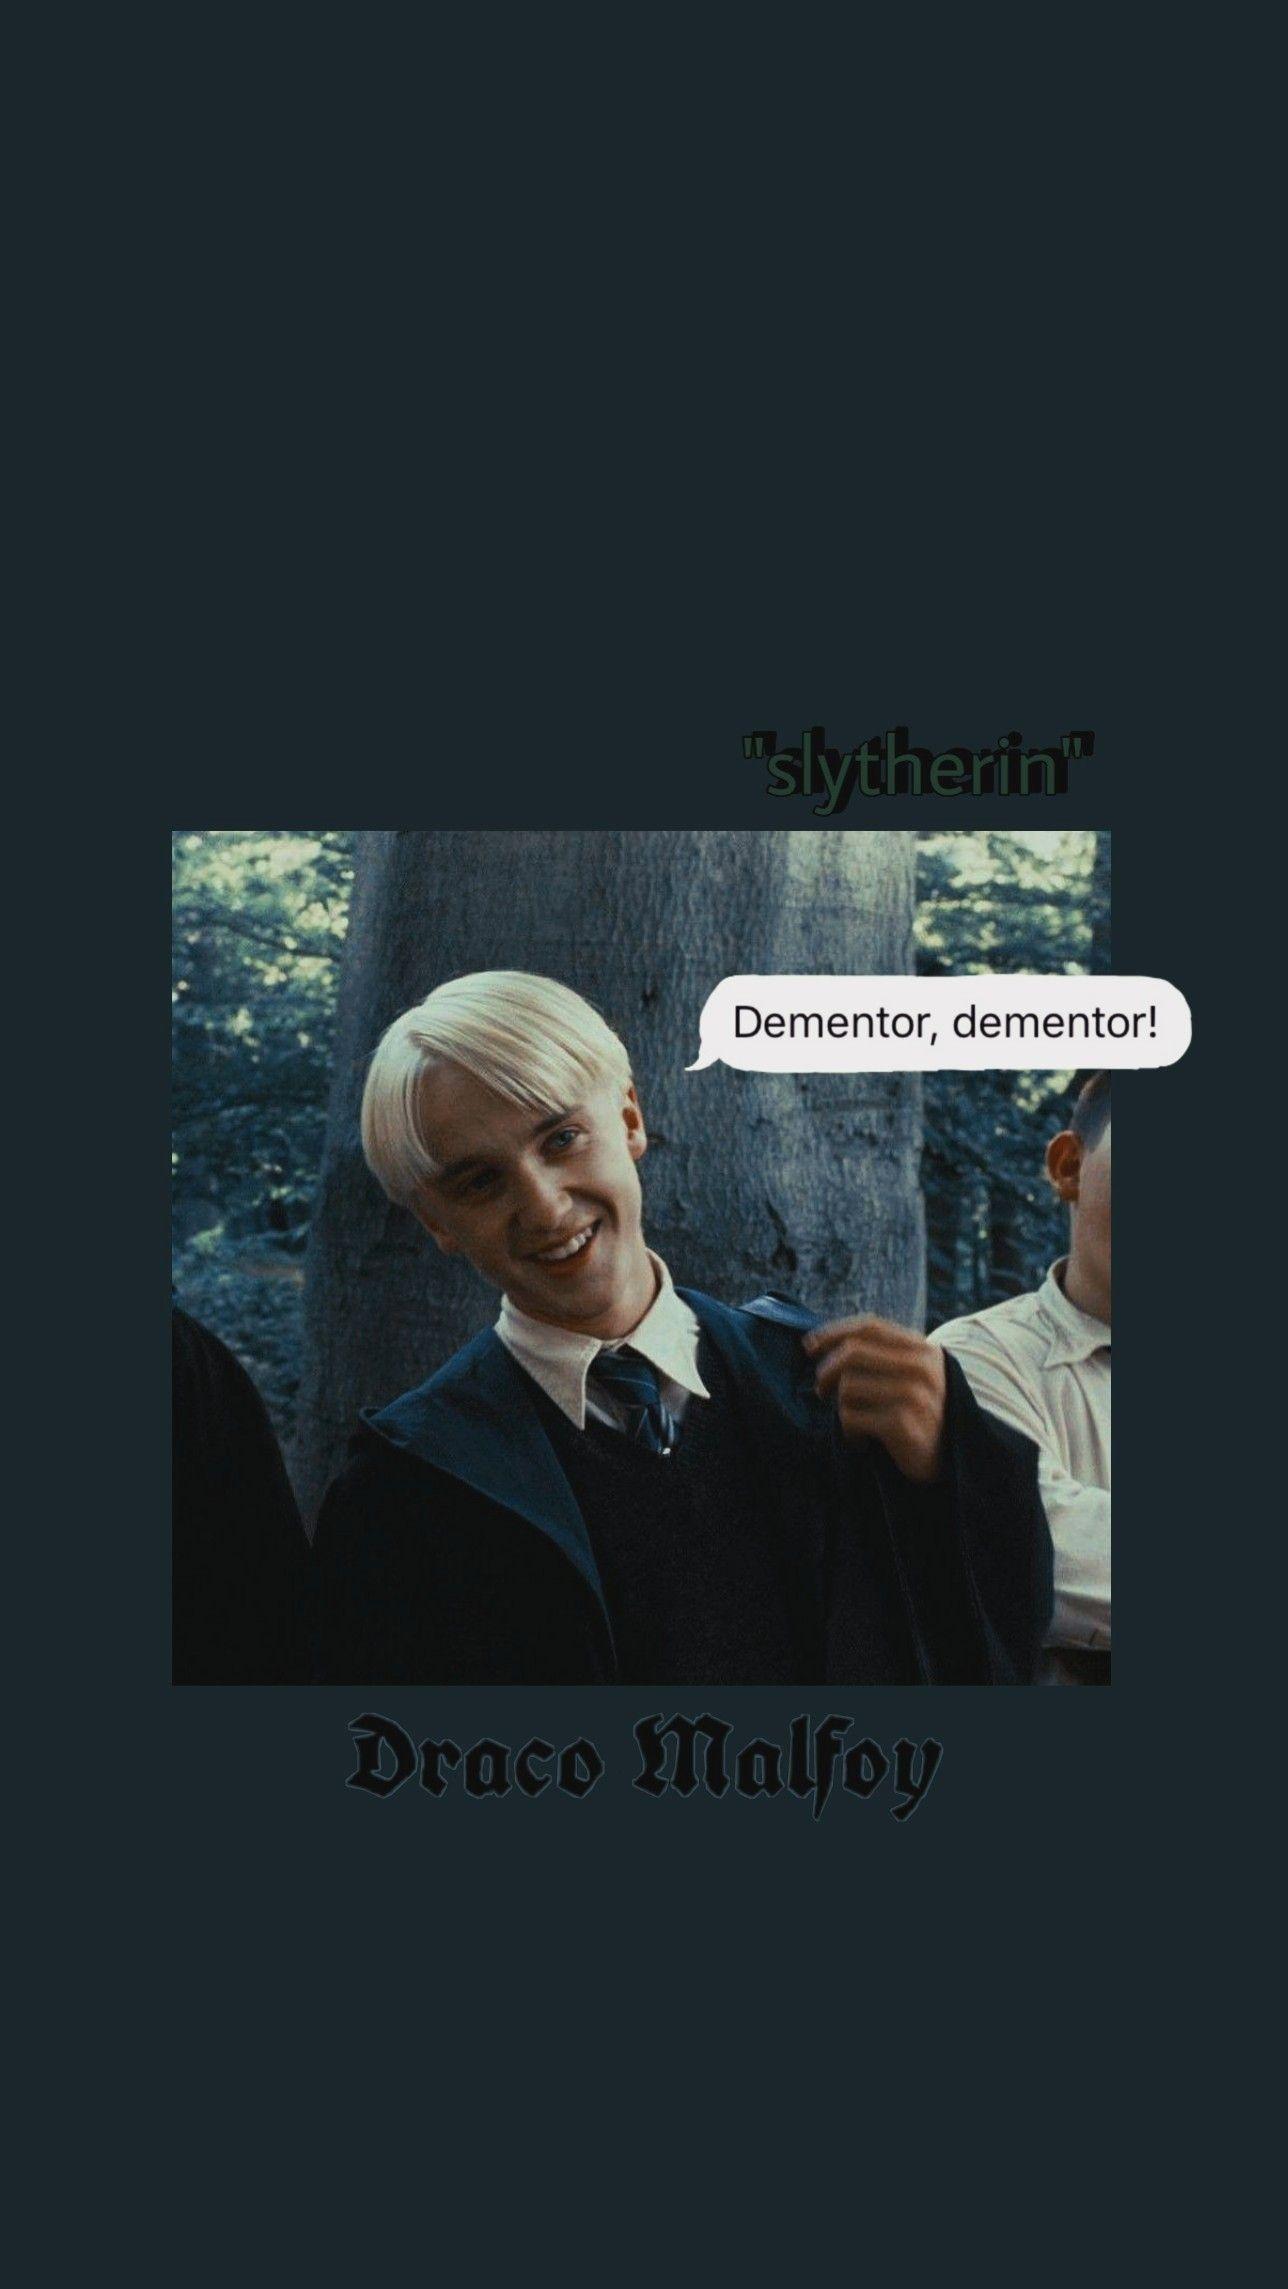 Pin Di Potterhead